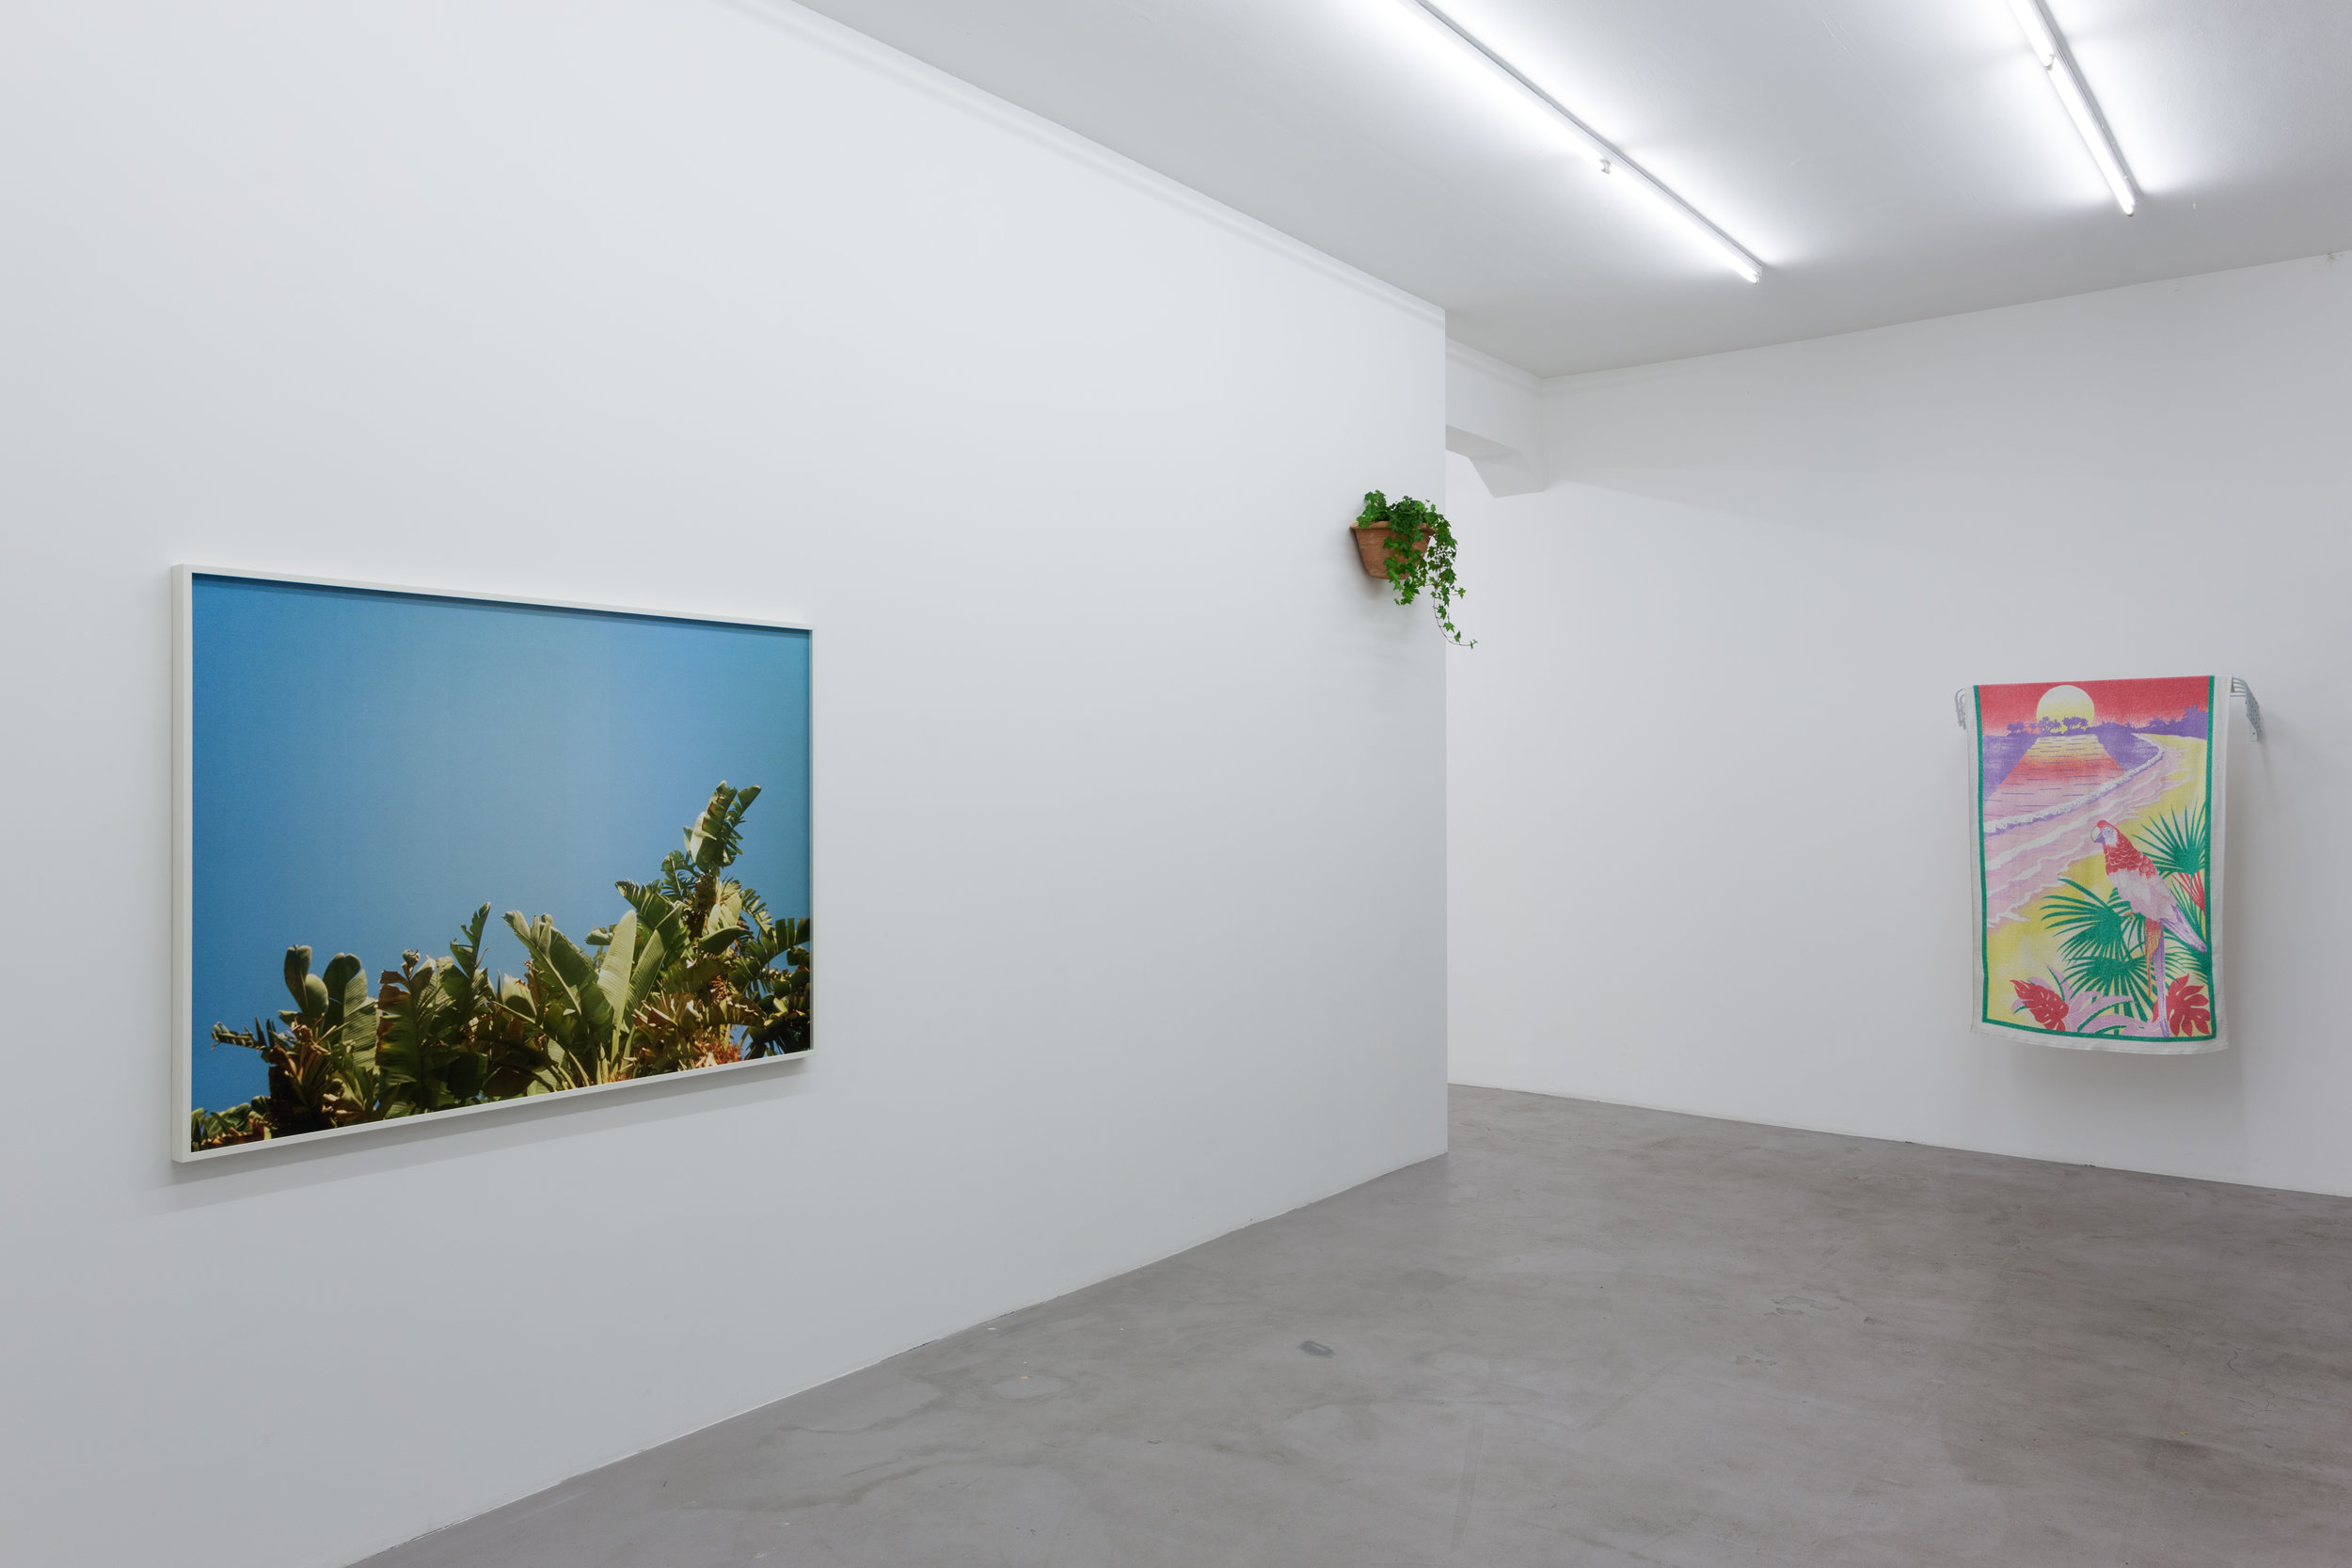 "Installation view, Talisa Lallai ""Lento Violento"", BolteLang, Zürich. Photo by Alexander Hana, © Talisa Lallai, Courtesy of BolteLang"